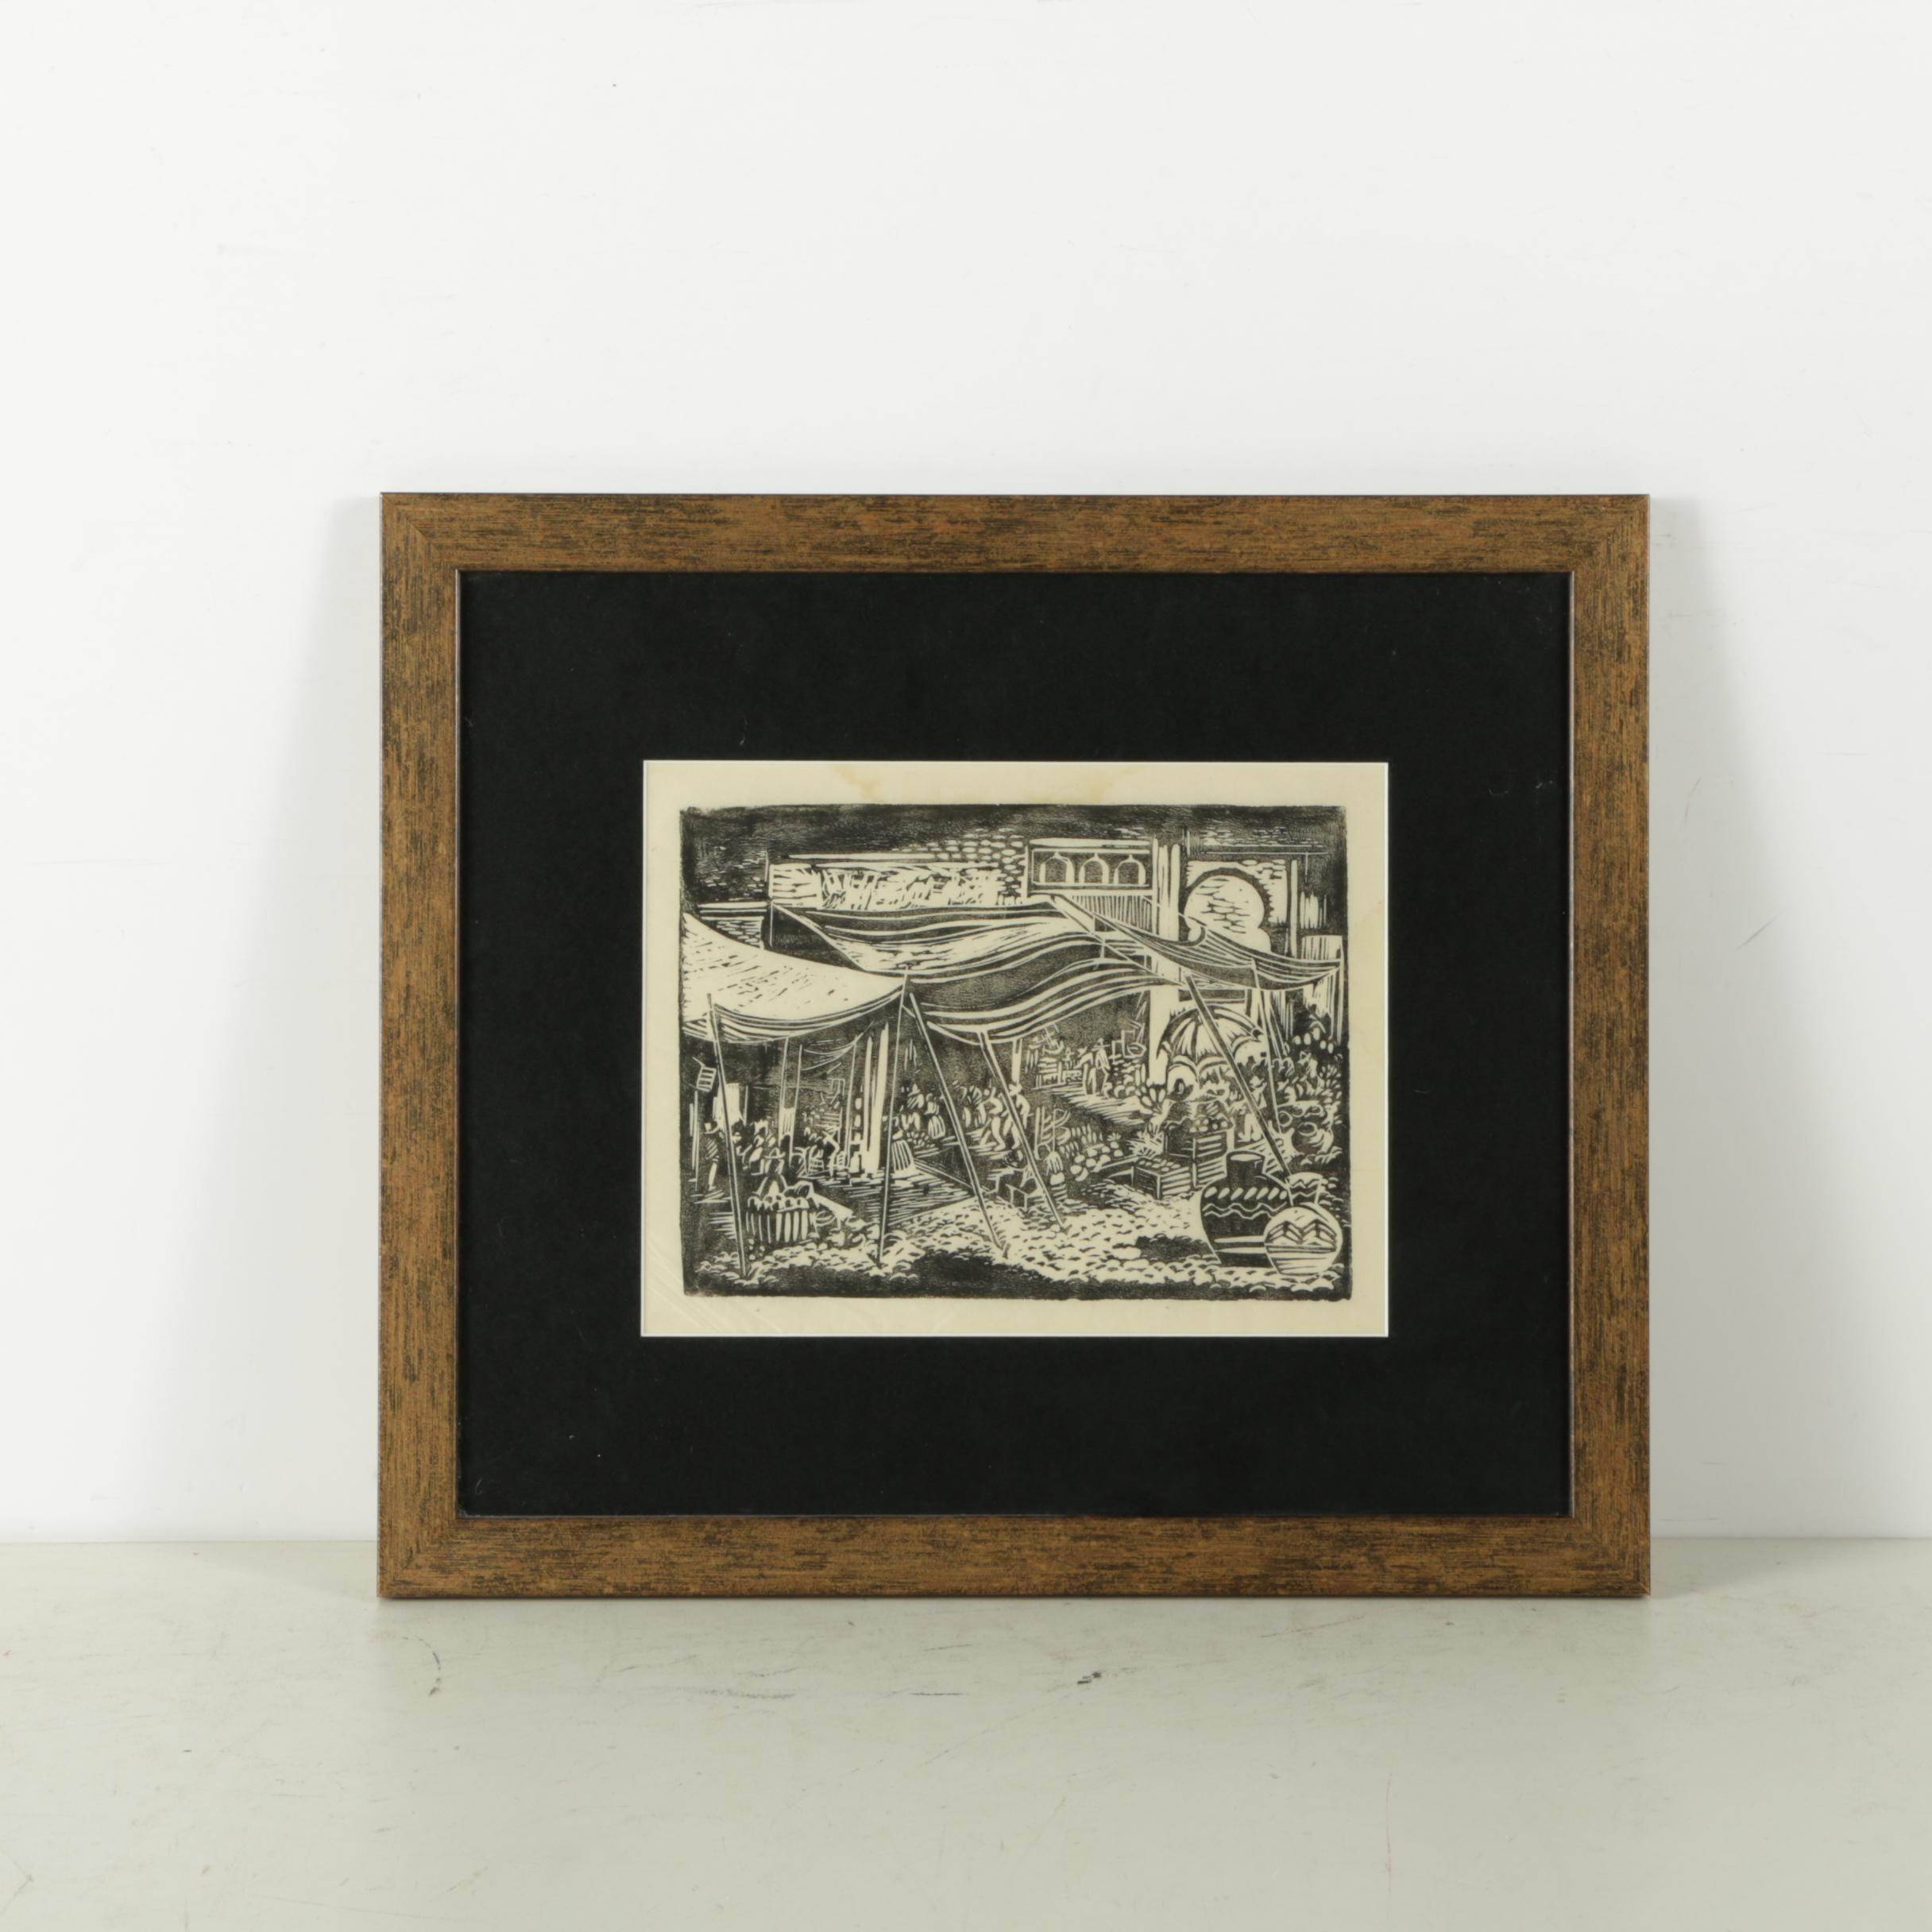 Woodblock Print on Rice Paper